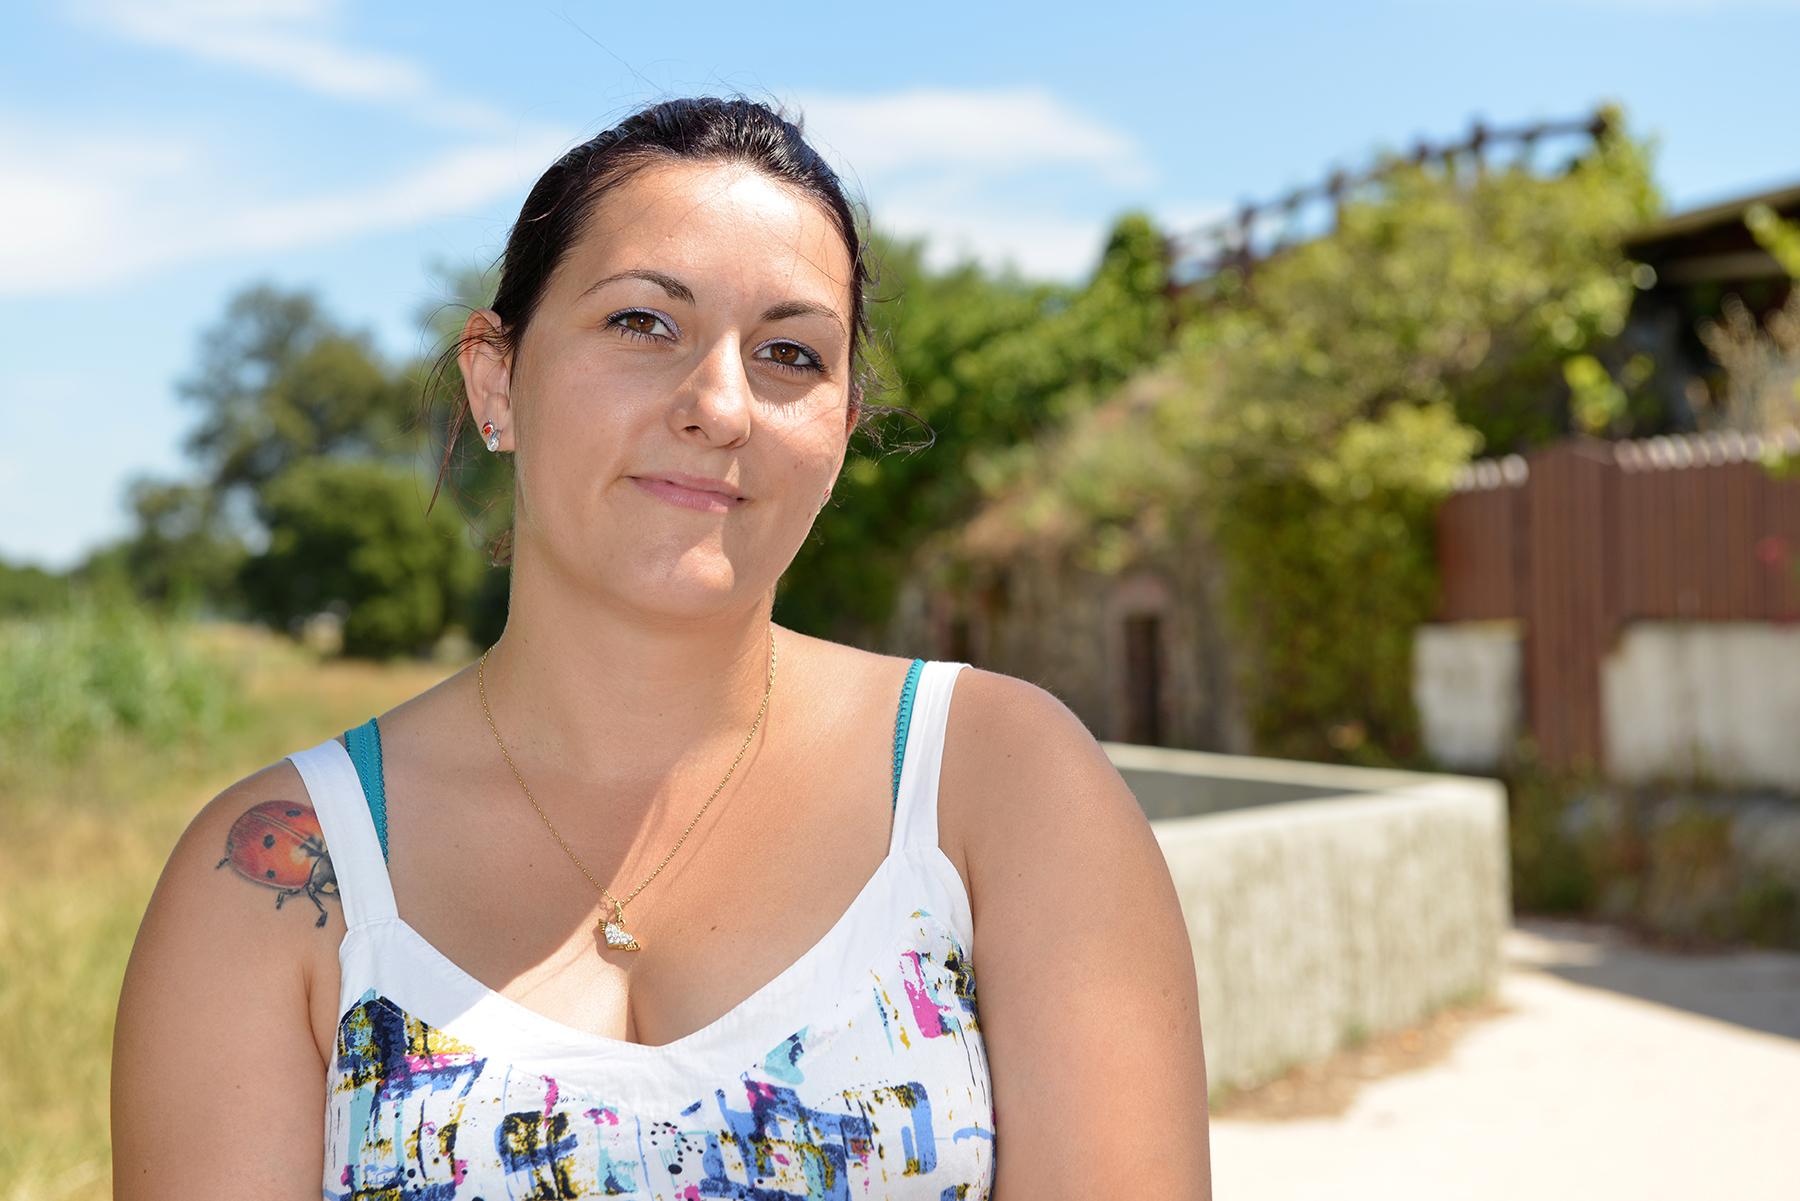 Maïlys Casati, 28 ans, habitante de Méan-Penhoët, infirmière libérale